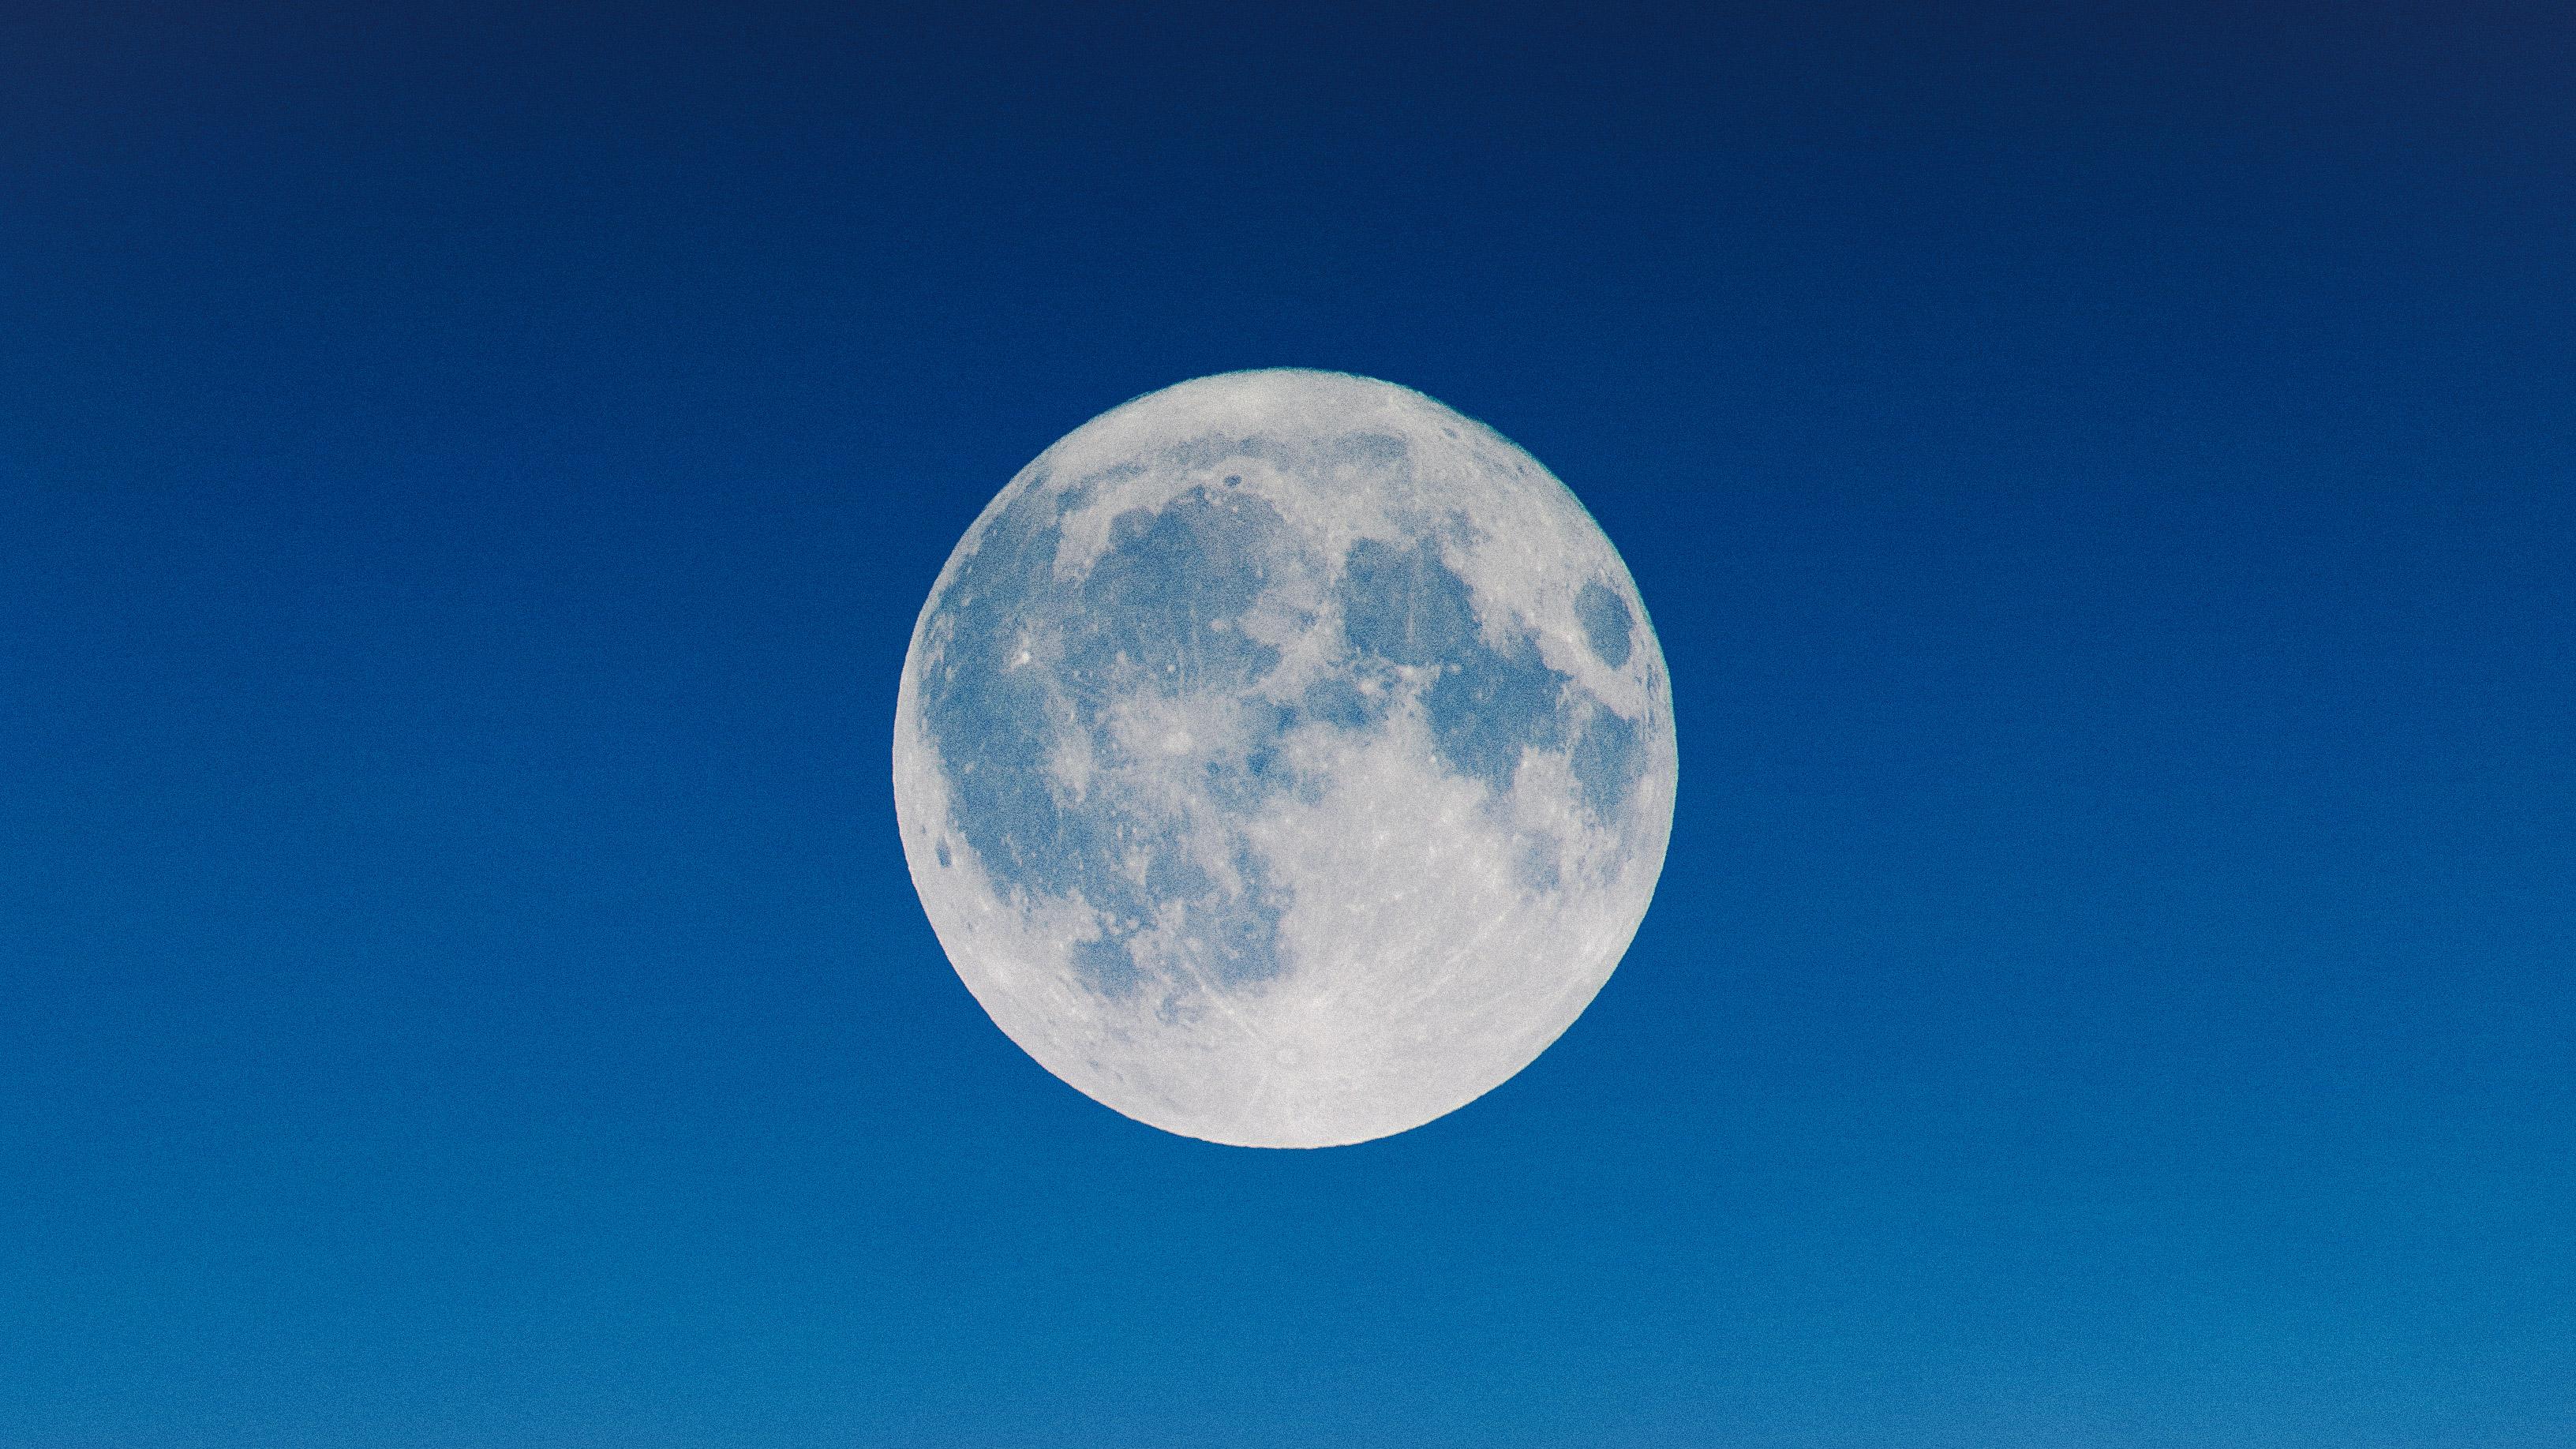 750x1334 Full Moon Illustration Iphone 6 Iphone 6s Iphone